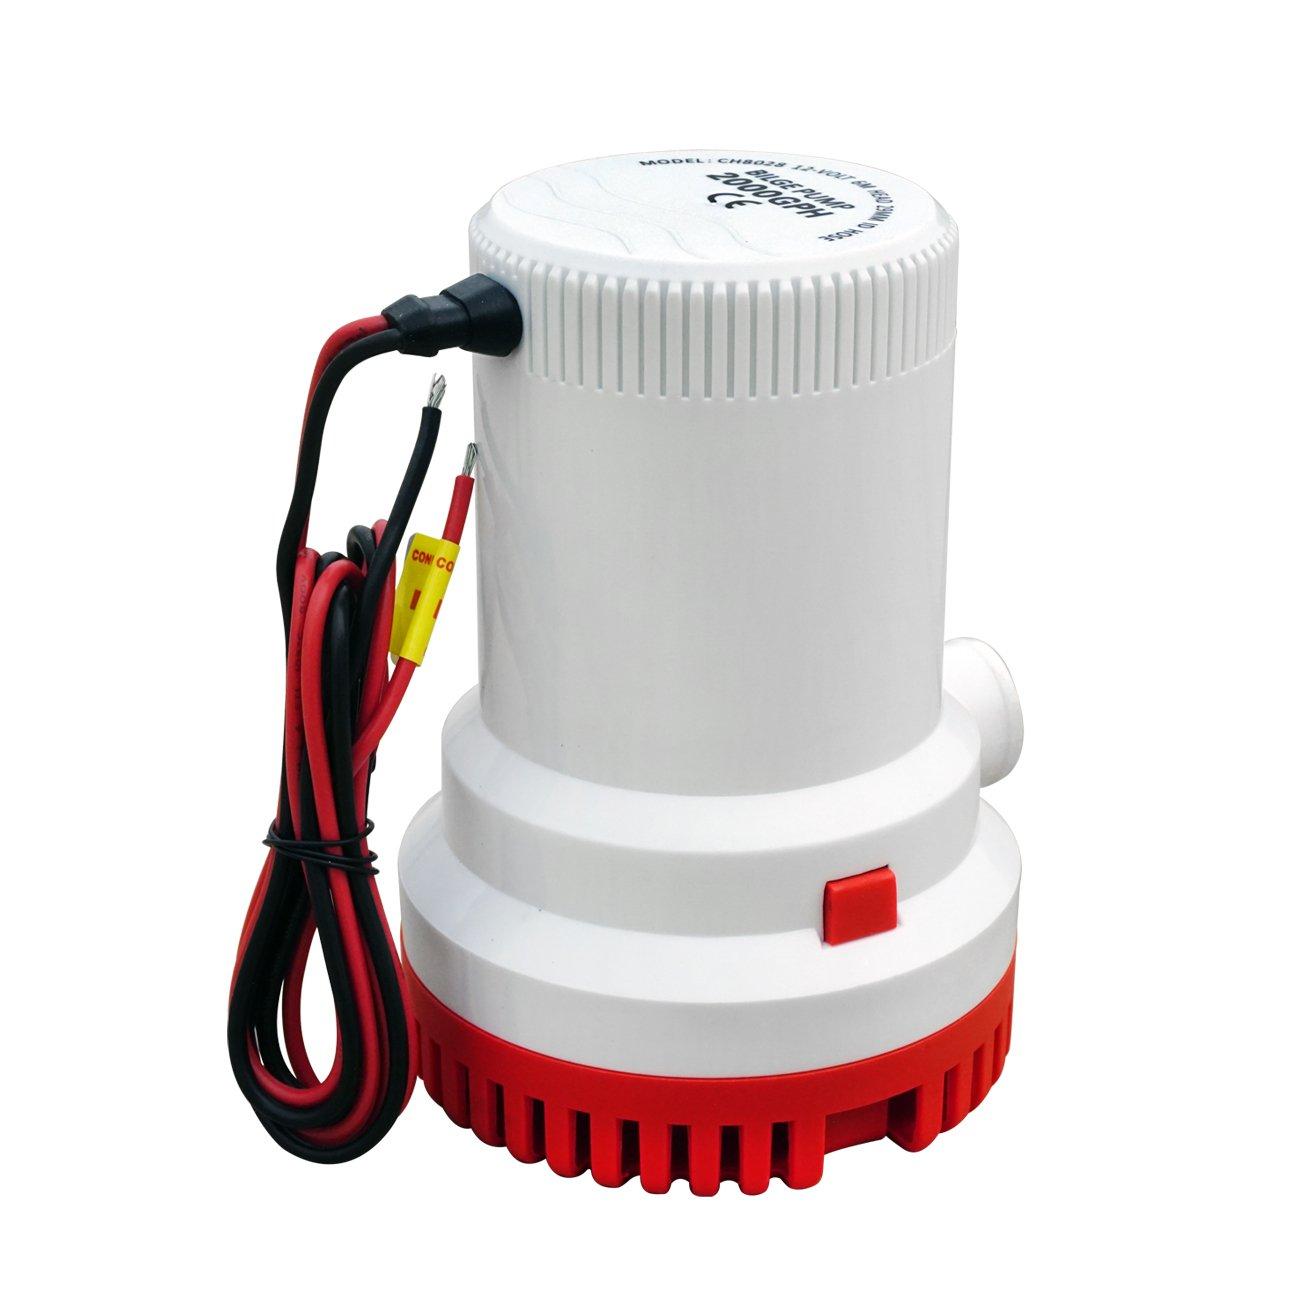 ECO-WORTHY Marine sentina sumergible bomba de sumidero 2000/GPH 12/V 29/mm ID manguera Silencioso completa sumergible